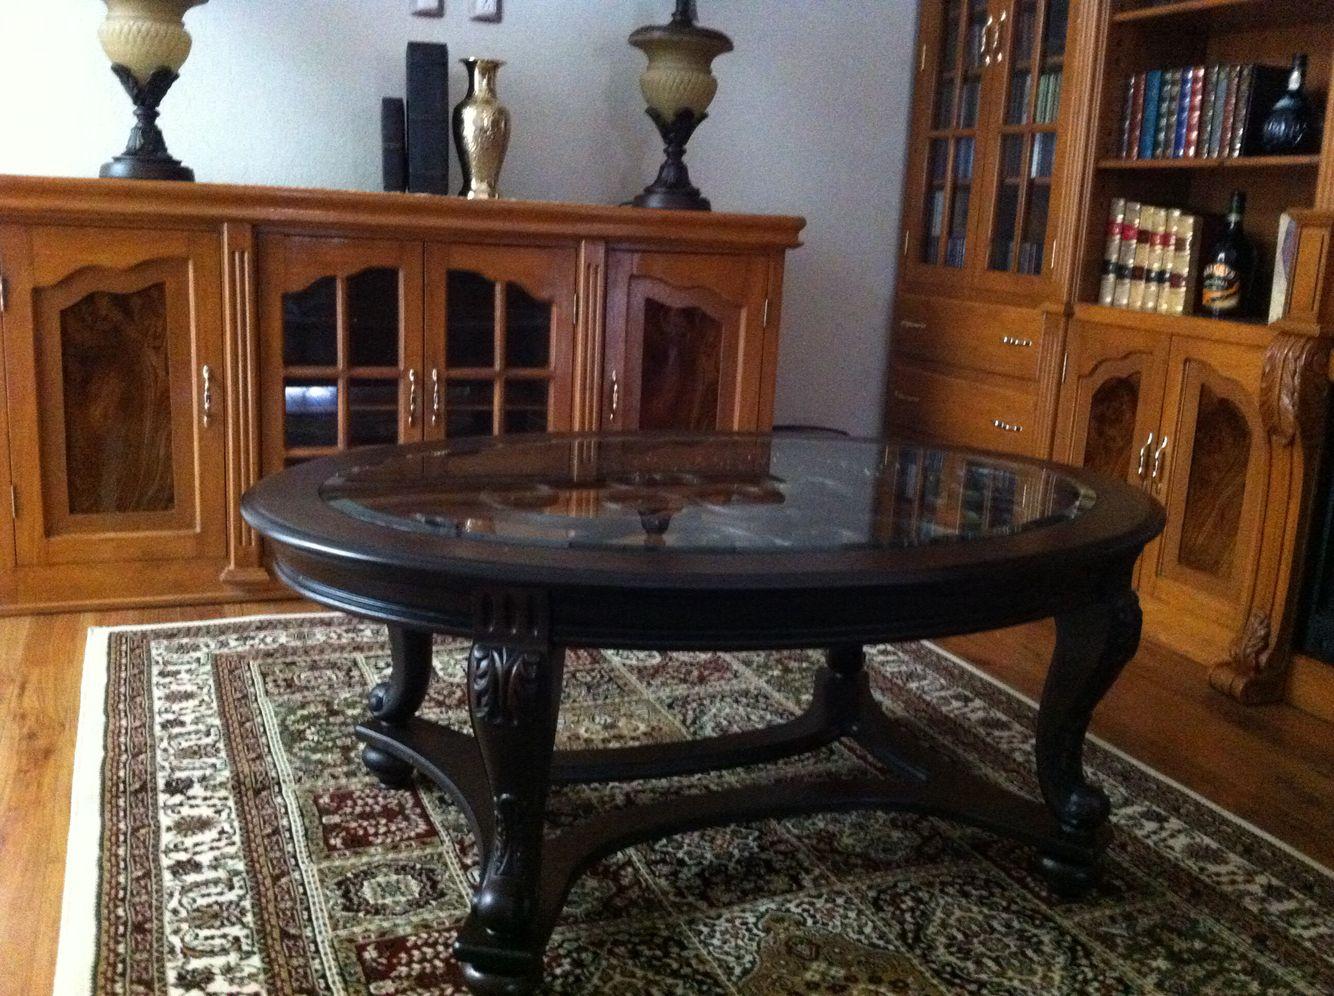 Mesa de centro oval sobre alfombra turca | Casas de lujo varios ...